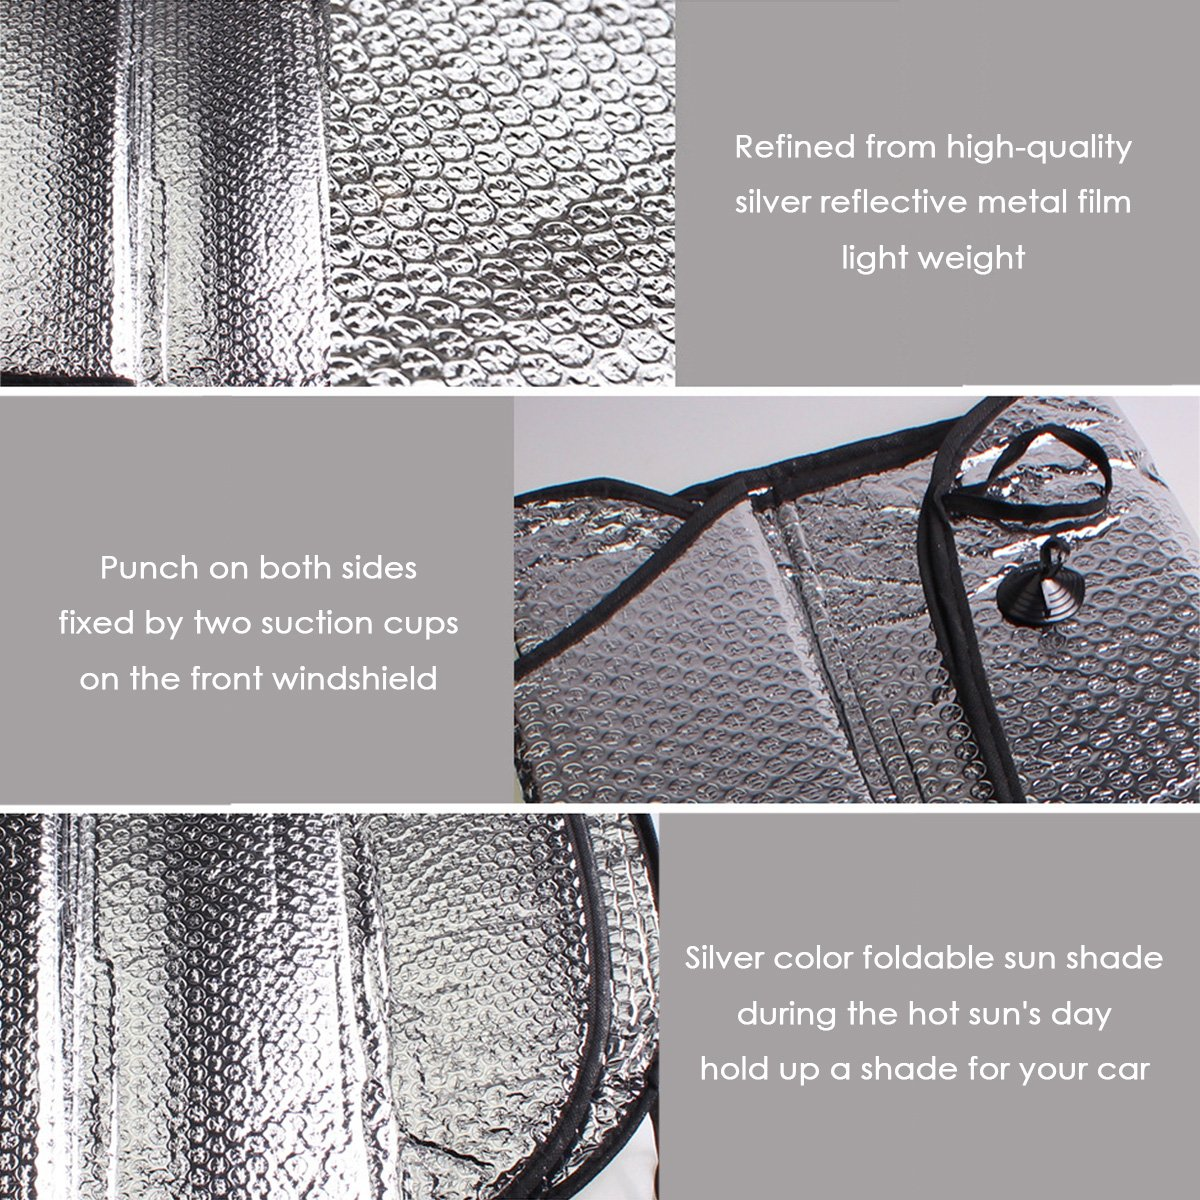 Windshield Visor,Universal Portable Multi-purpose Foldable 2PCS RAYTHEONER Car Sun Shades Car Front Rear Window Sunshade Aluminium Foil,Silver Visor Cover